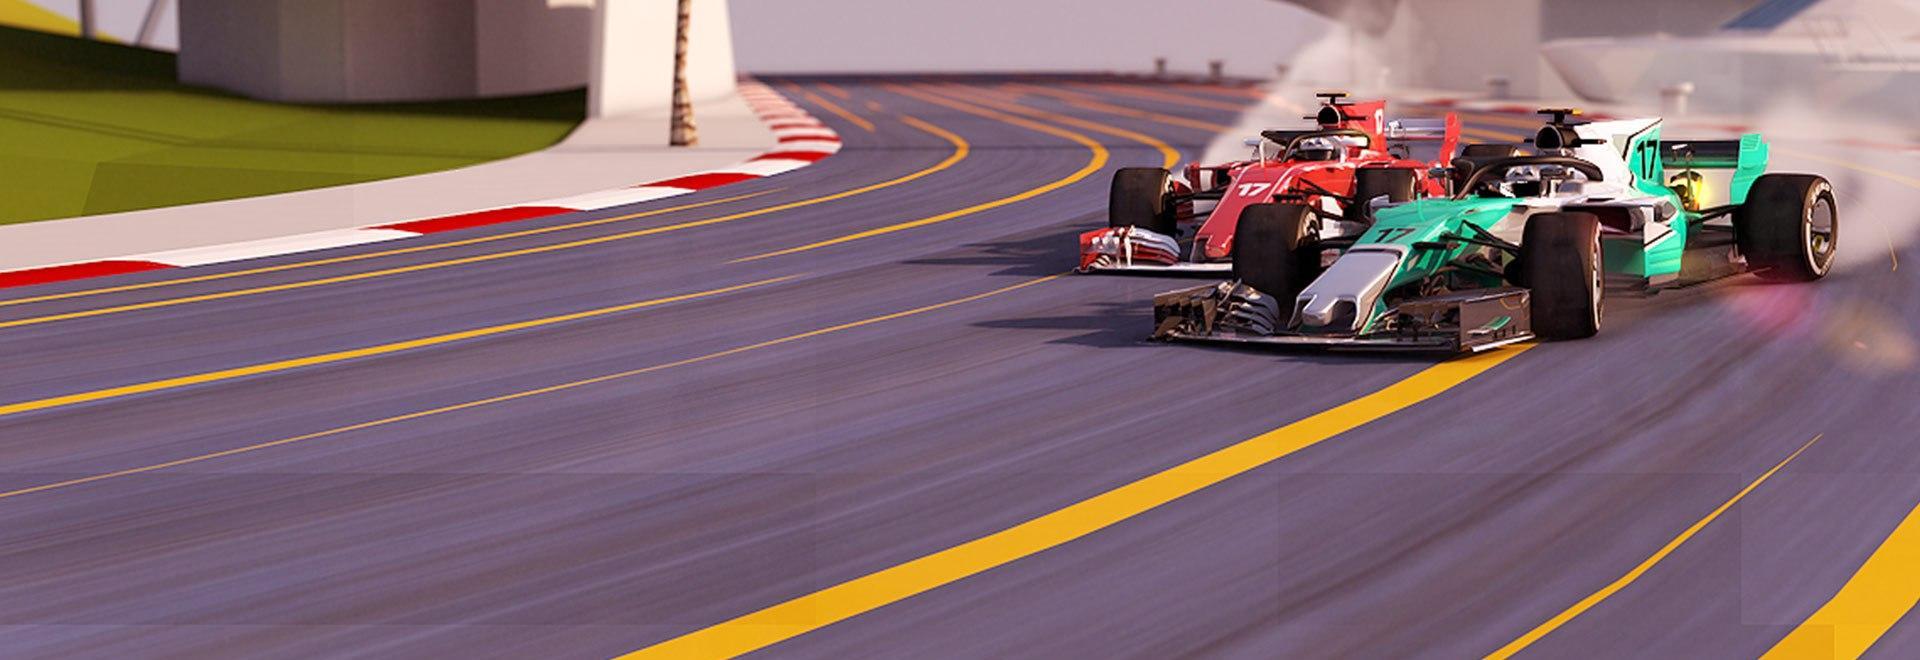 F1 Fever